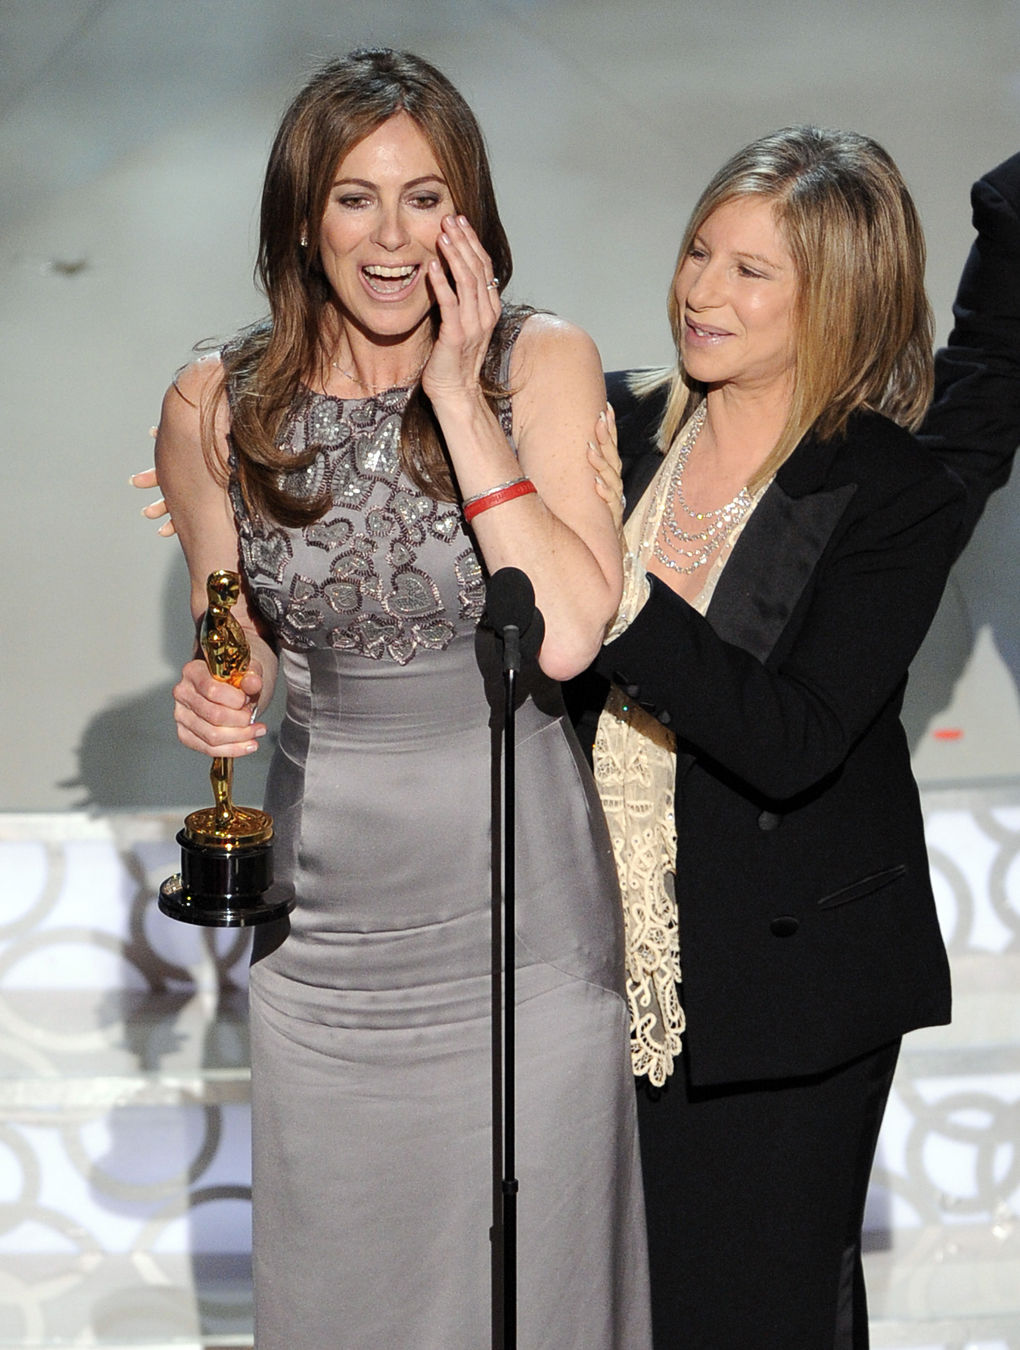 82nd Academy Awards Program Avatar March 2010 Oscars Alec Baldwin Sandra Bullock